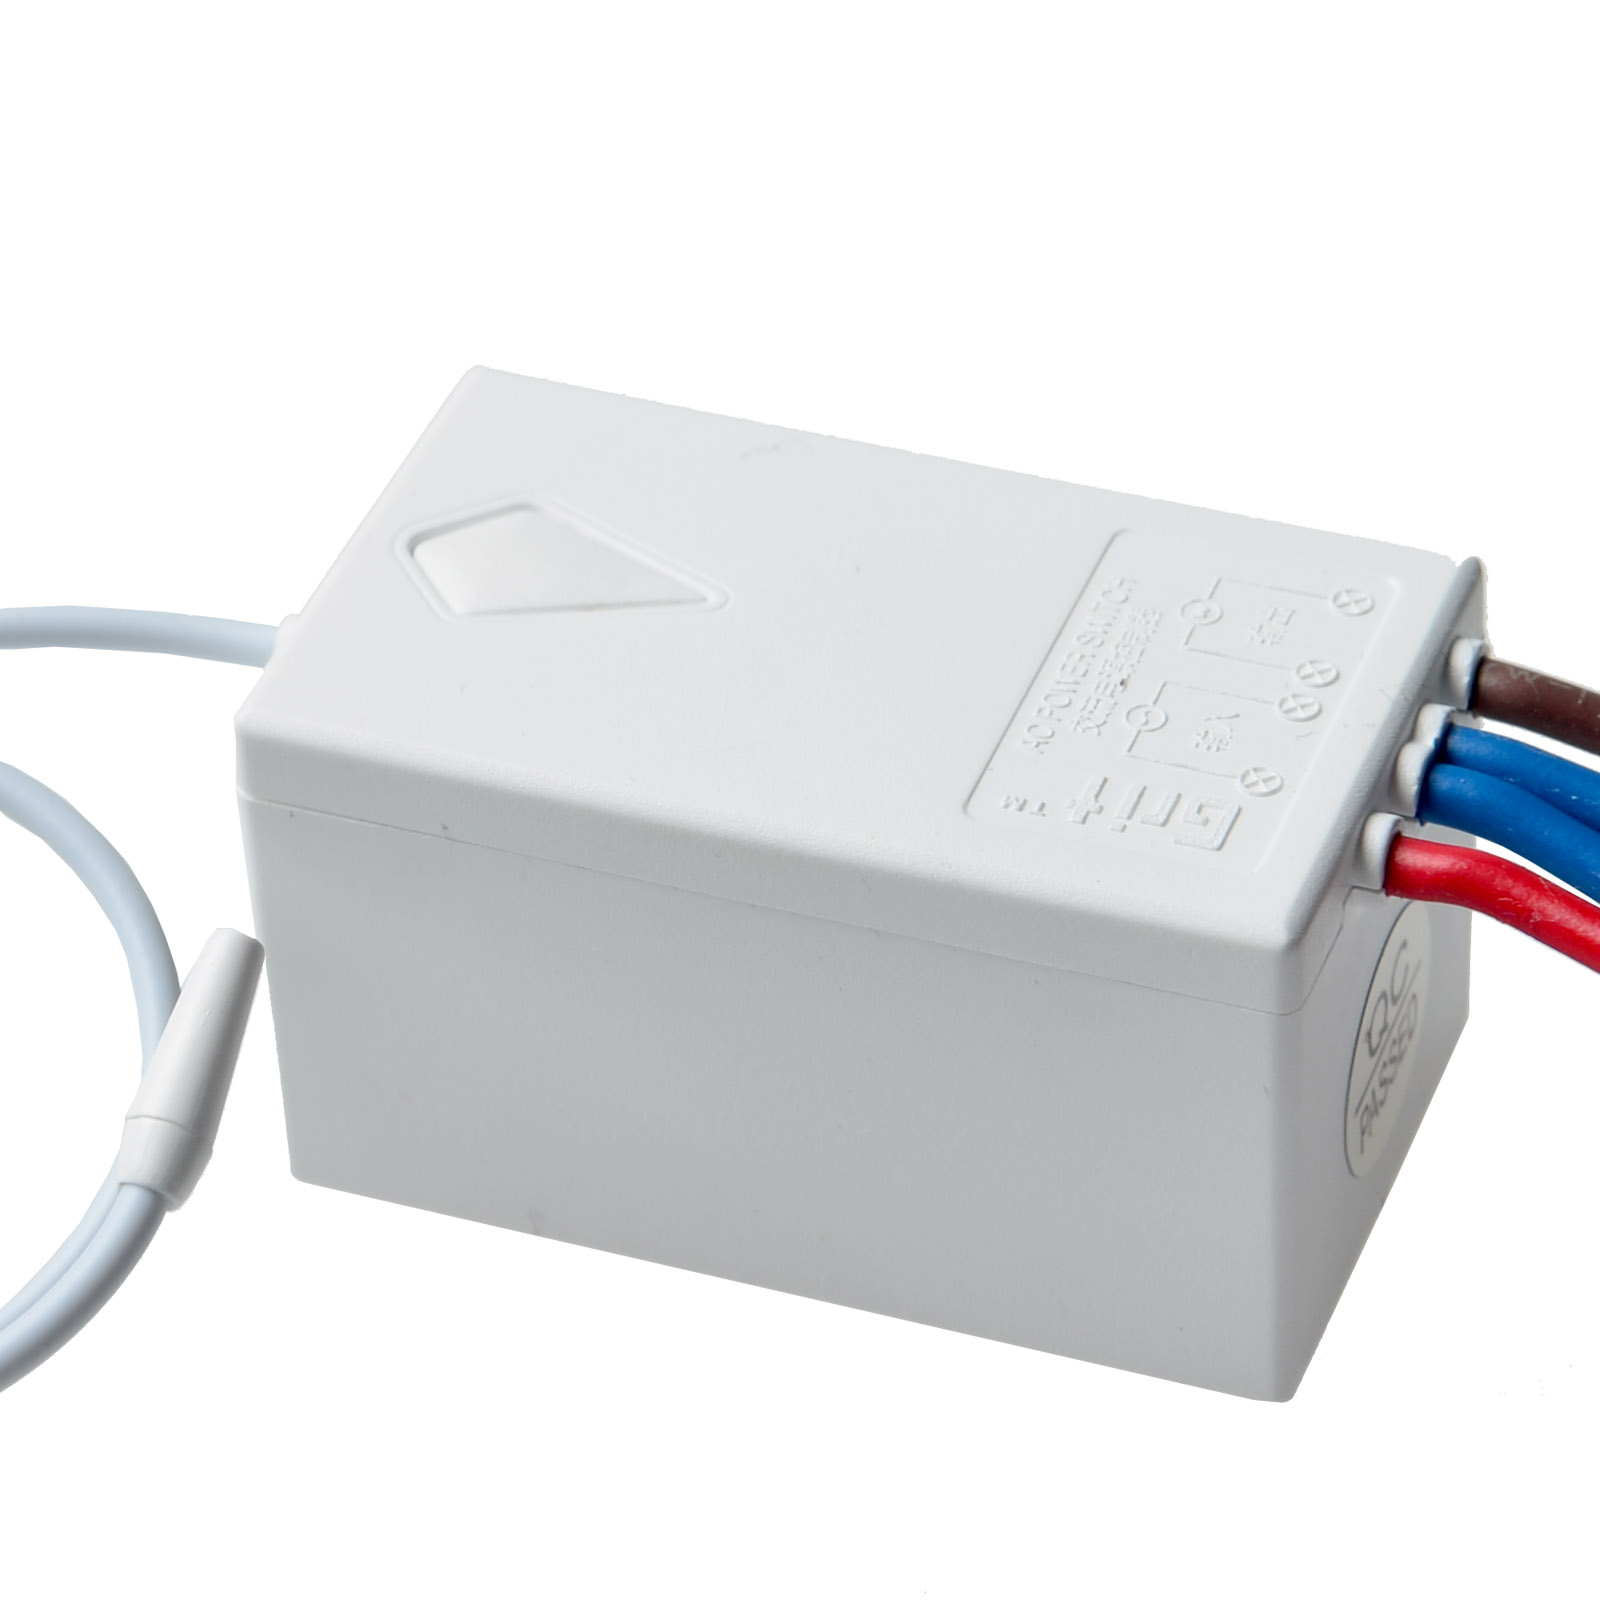 Wireless Smart Lamp Light Wall Switch 2 Ways ON/OFF Remote Control w ...